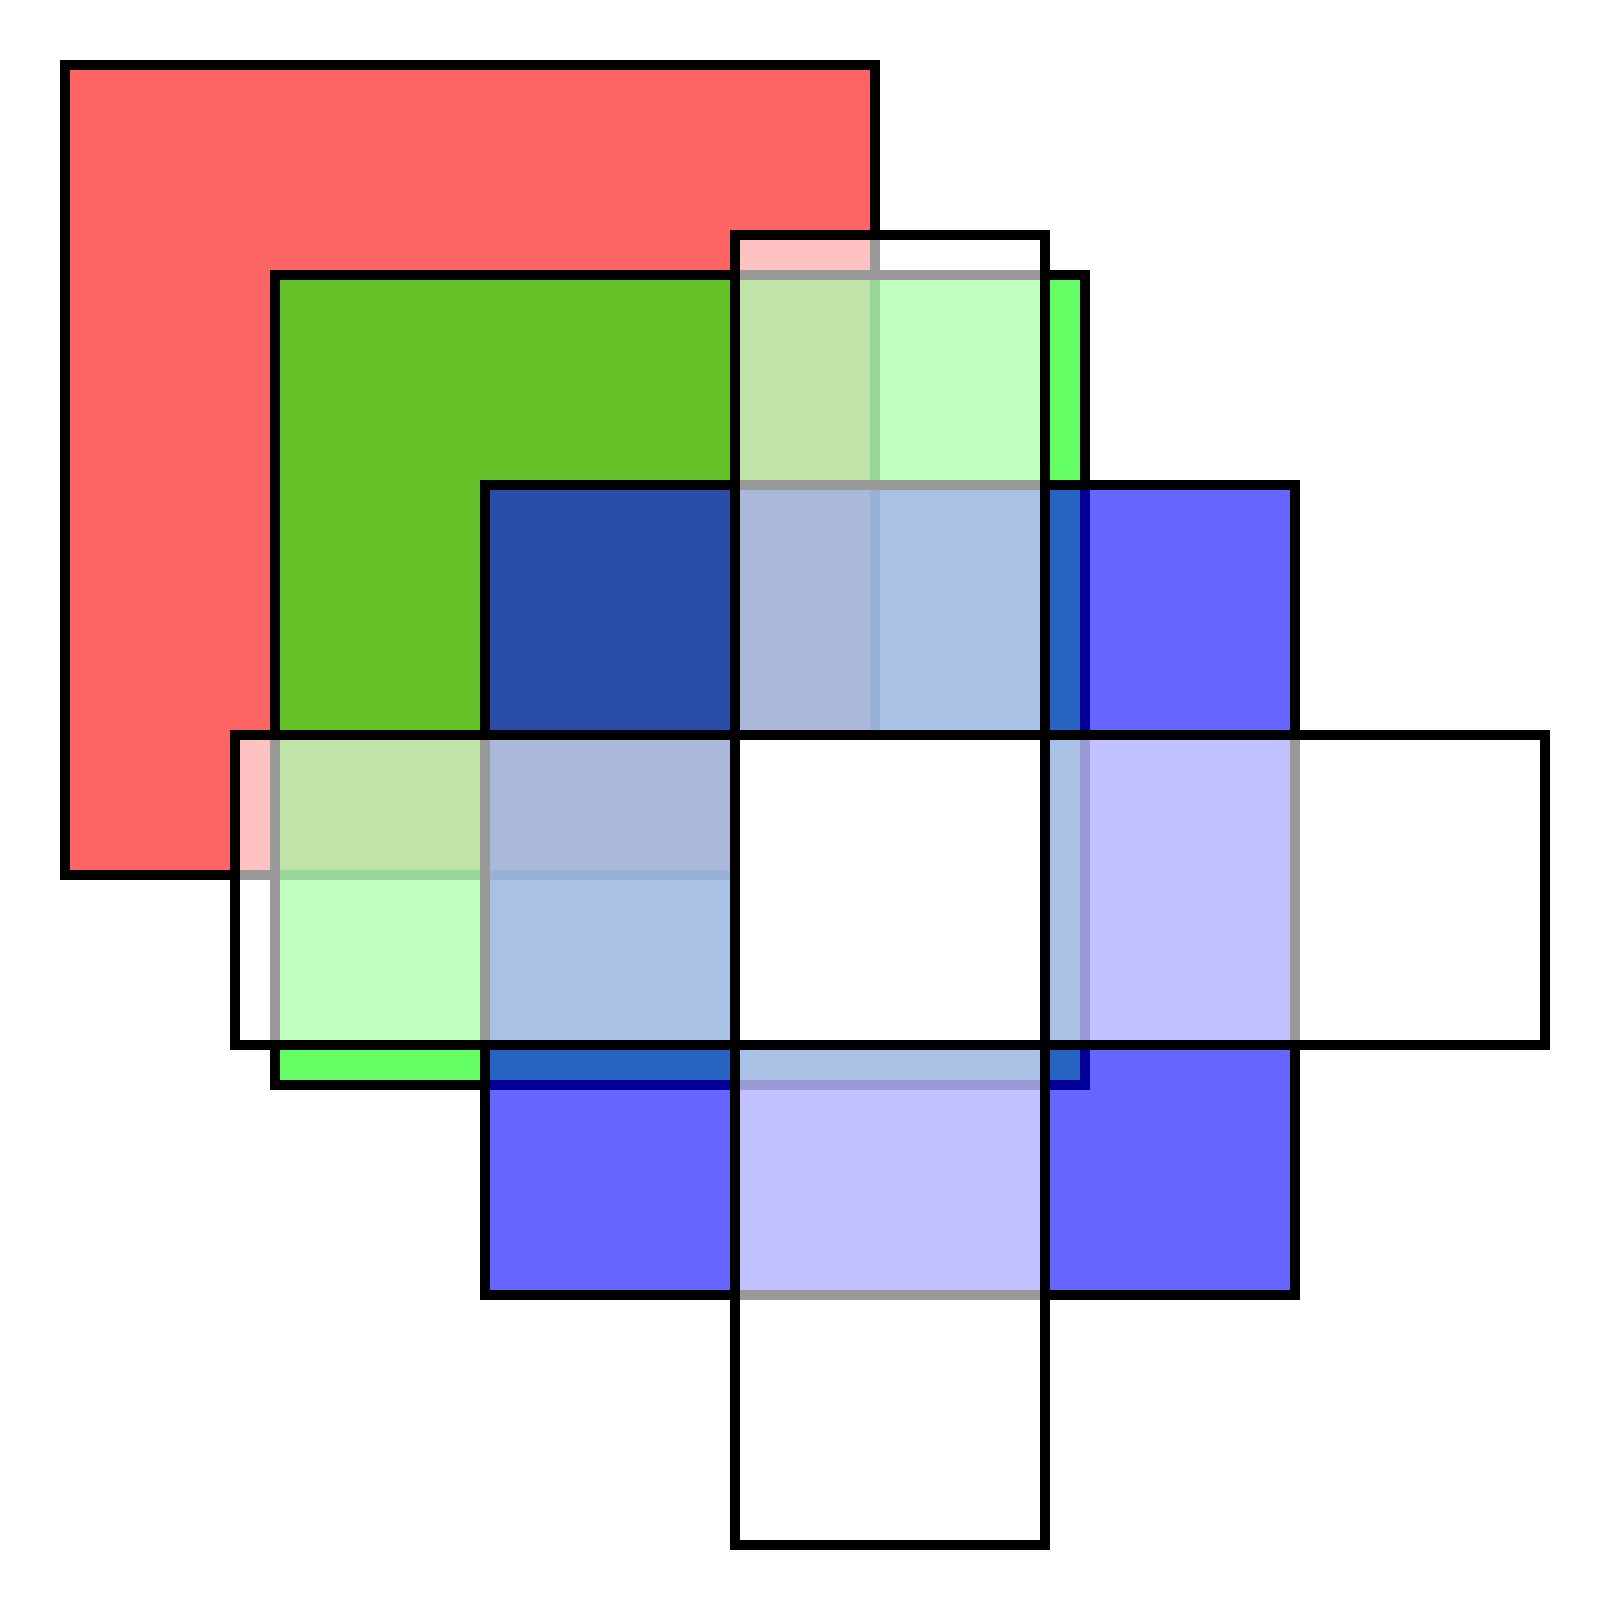 B8b87e2c 2867 4205 bb9f a6fc5e43ac8b?auto=format&fit=crop&h=570&w=430